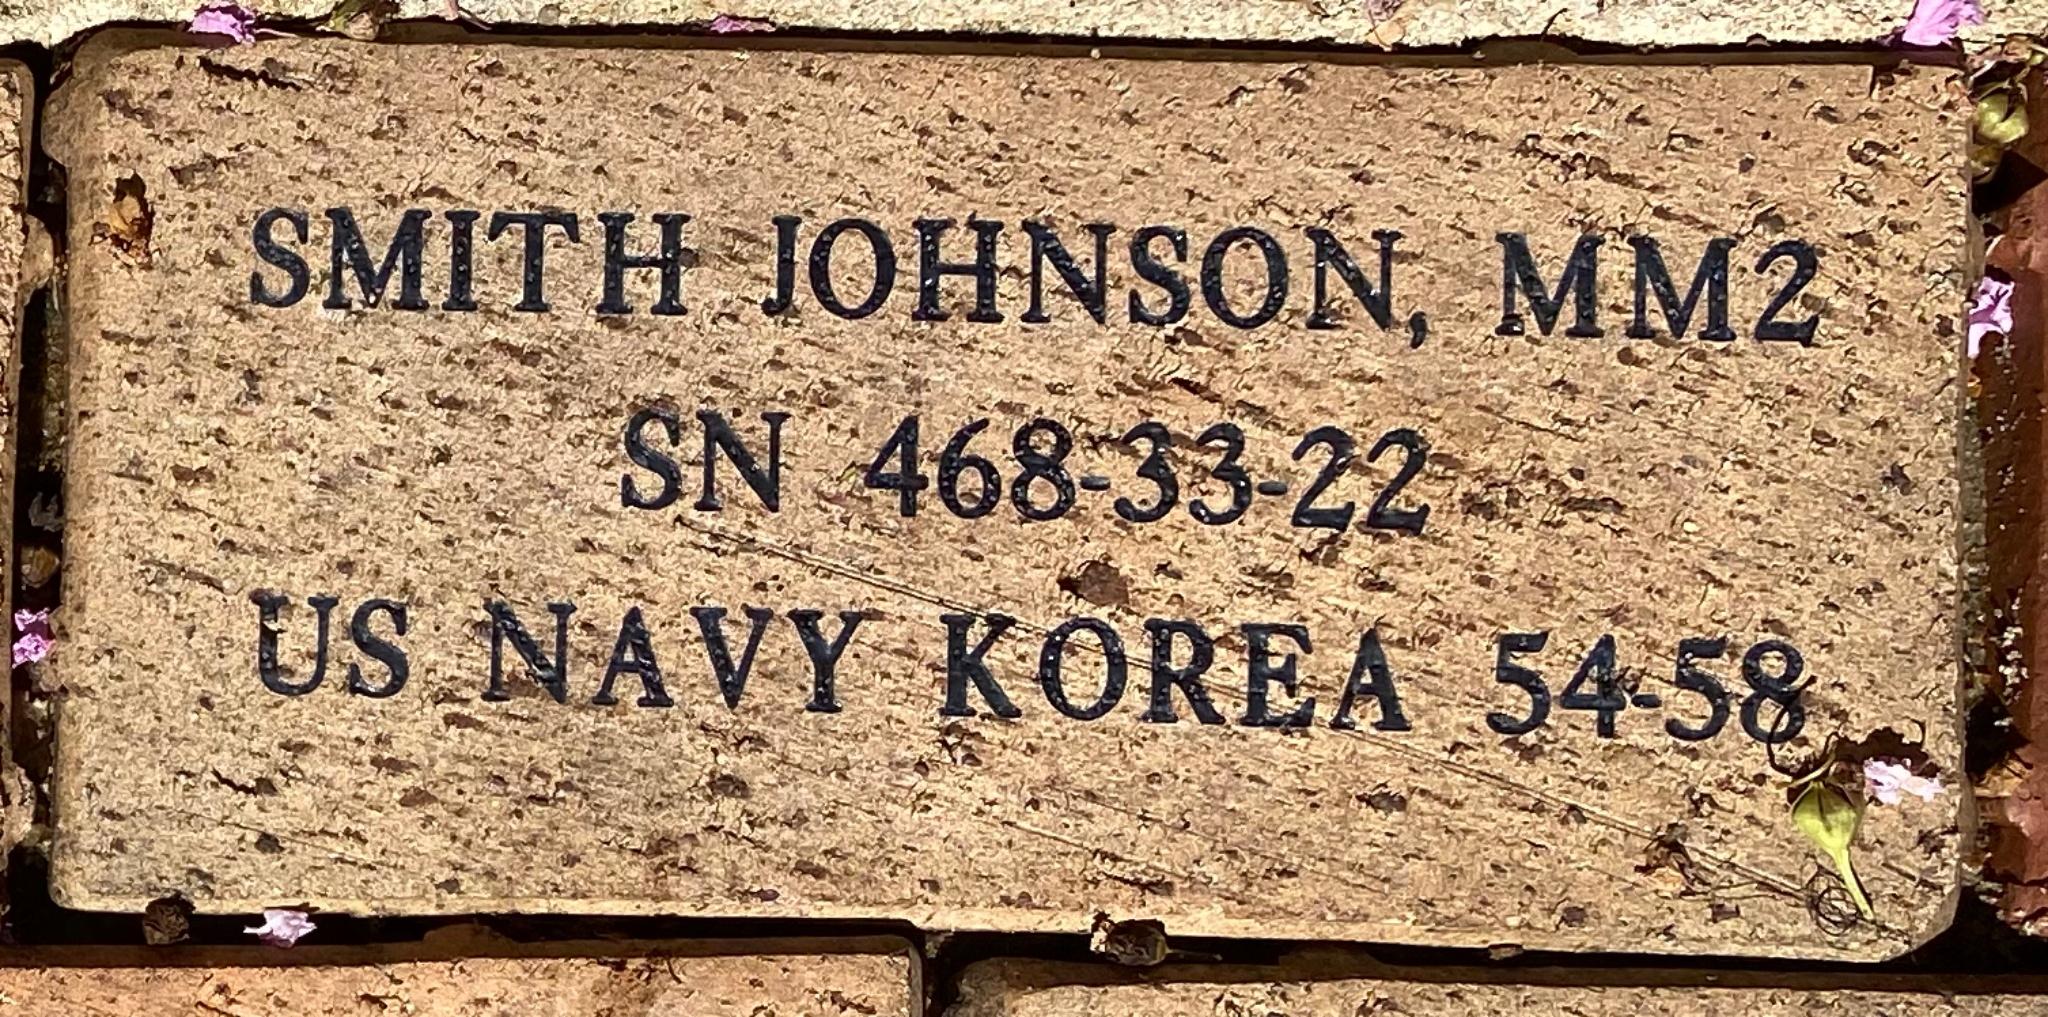 SMITH JOHNSON, MM2 SN 468-33-22 US NAVY KOREA 54-58